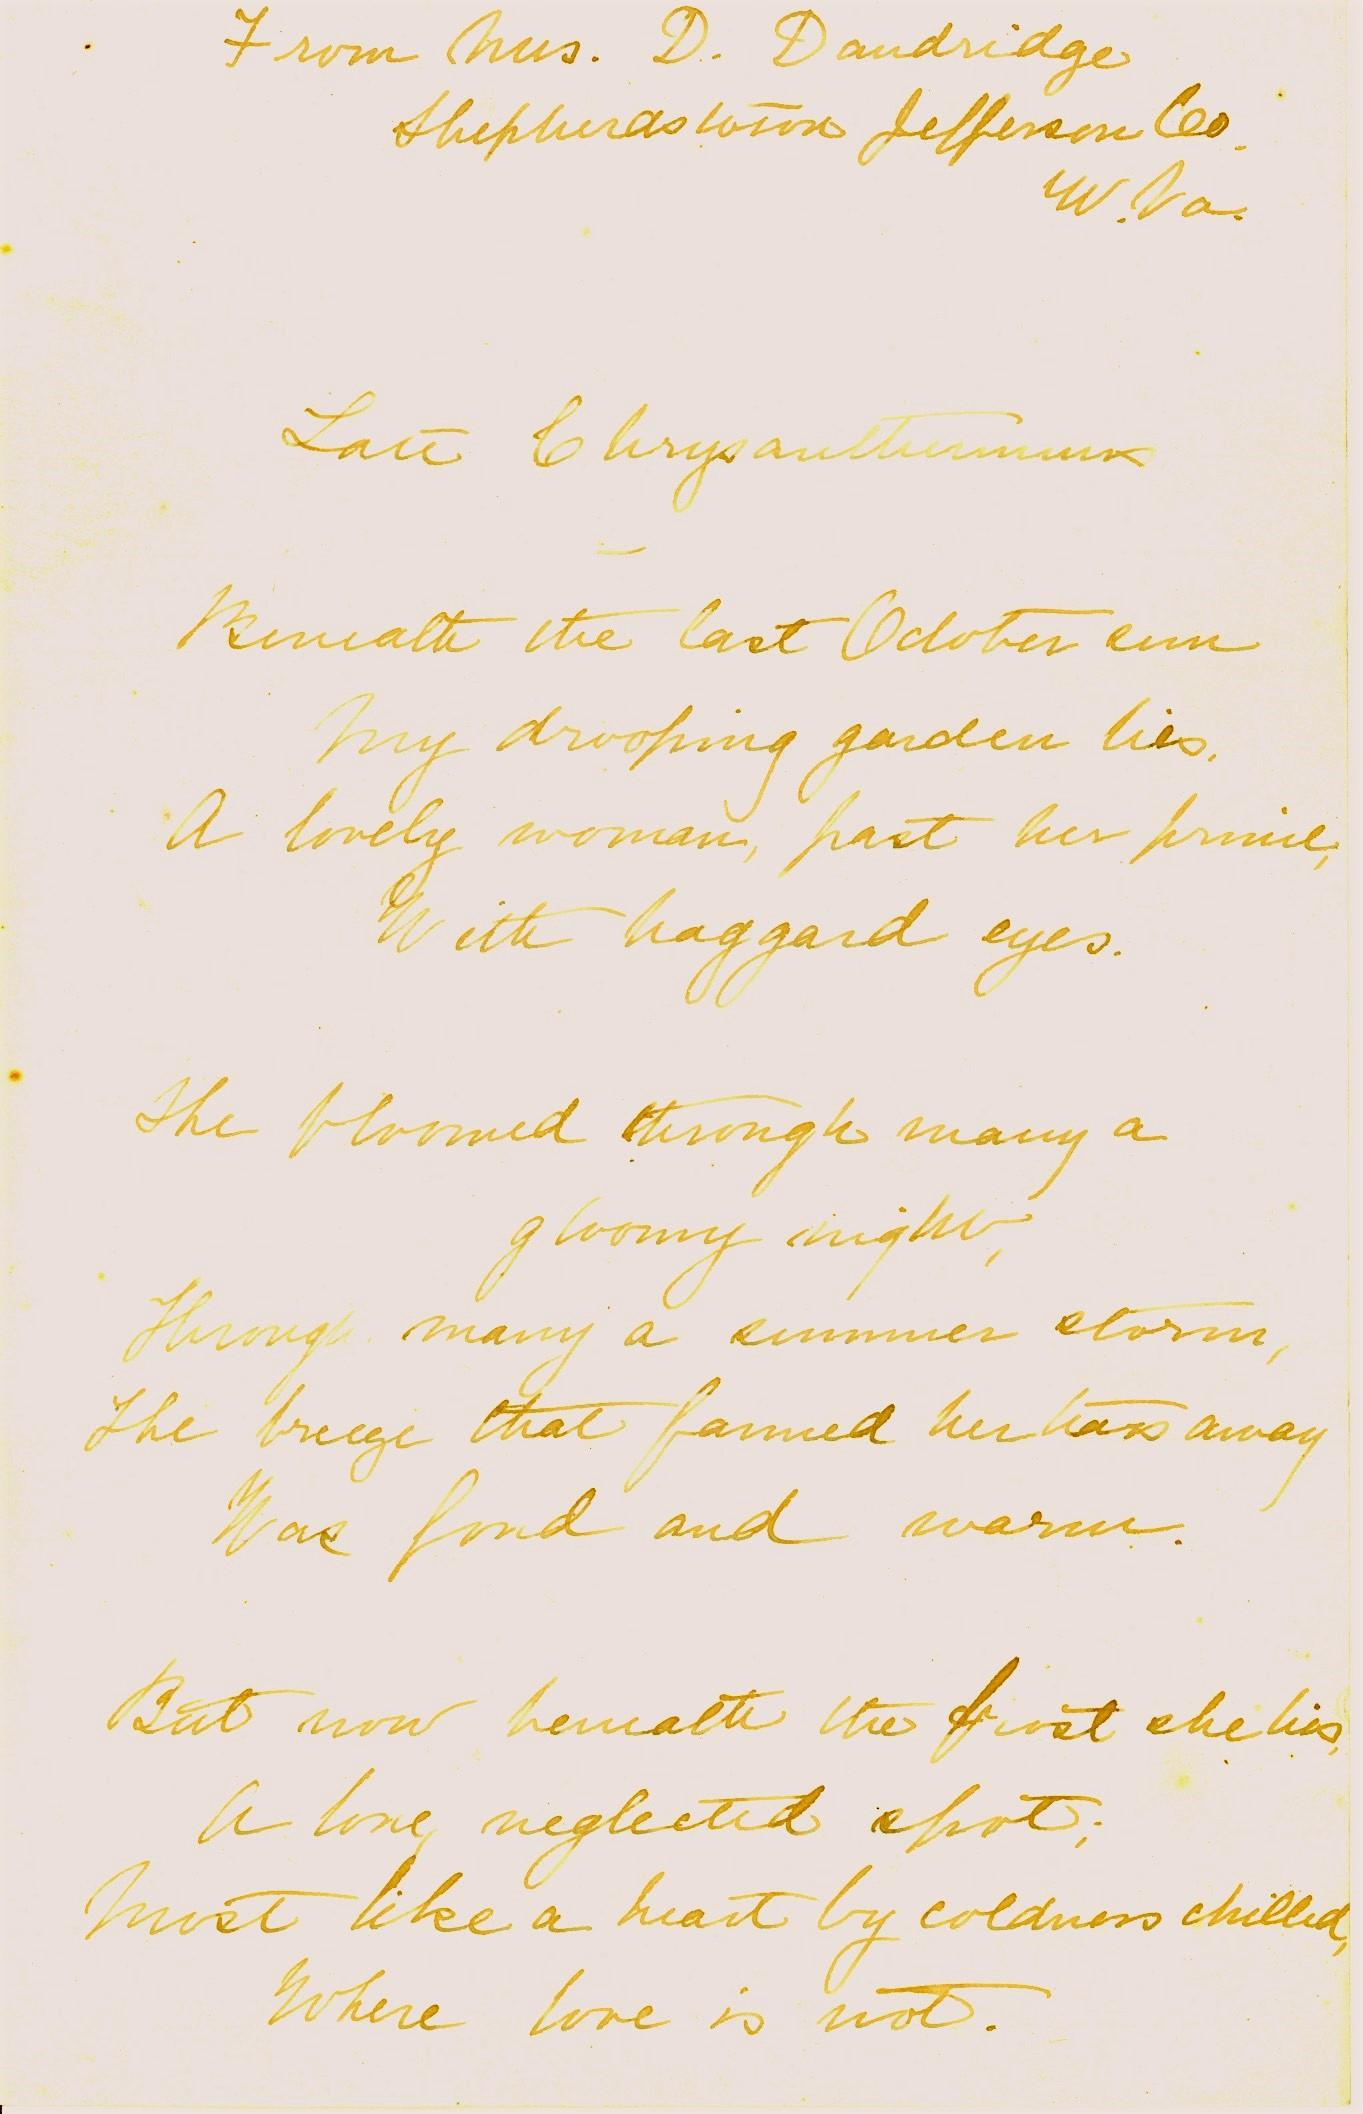 Danske Dandridge poem, Late Chrysanthemum